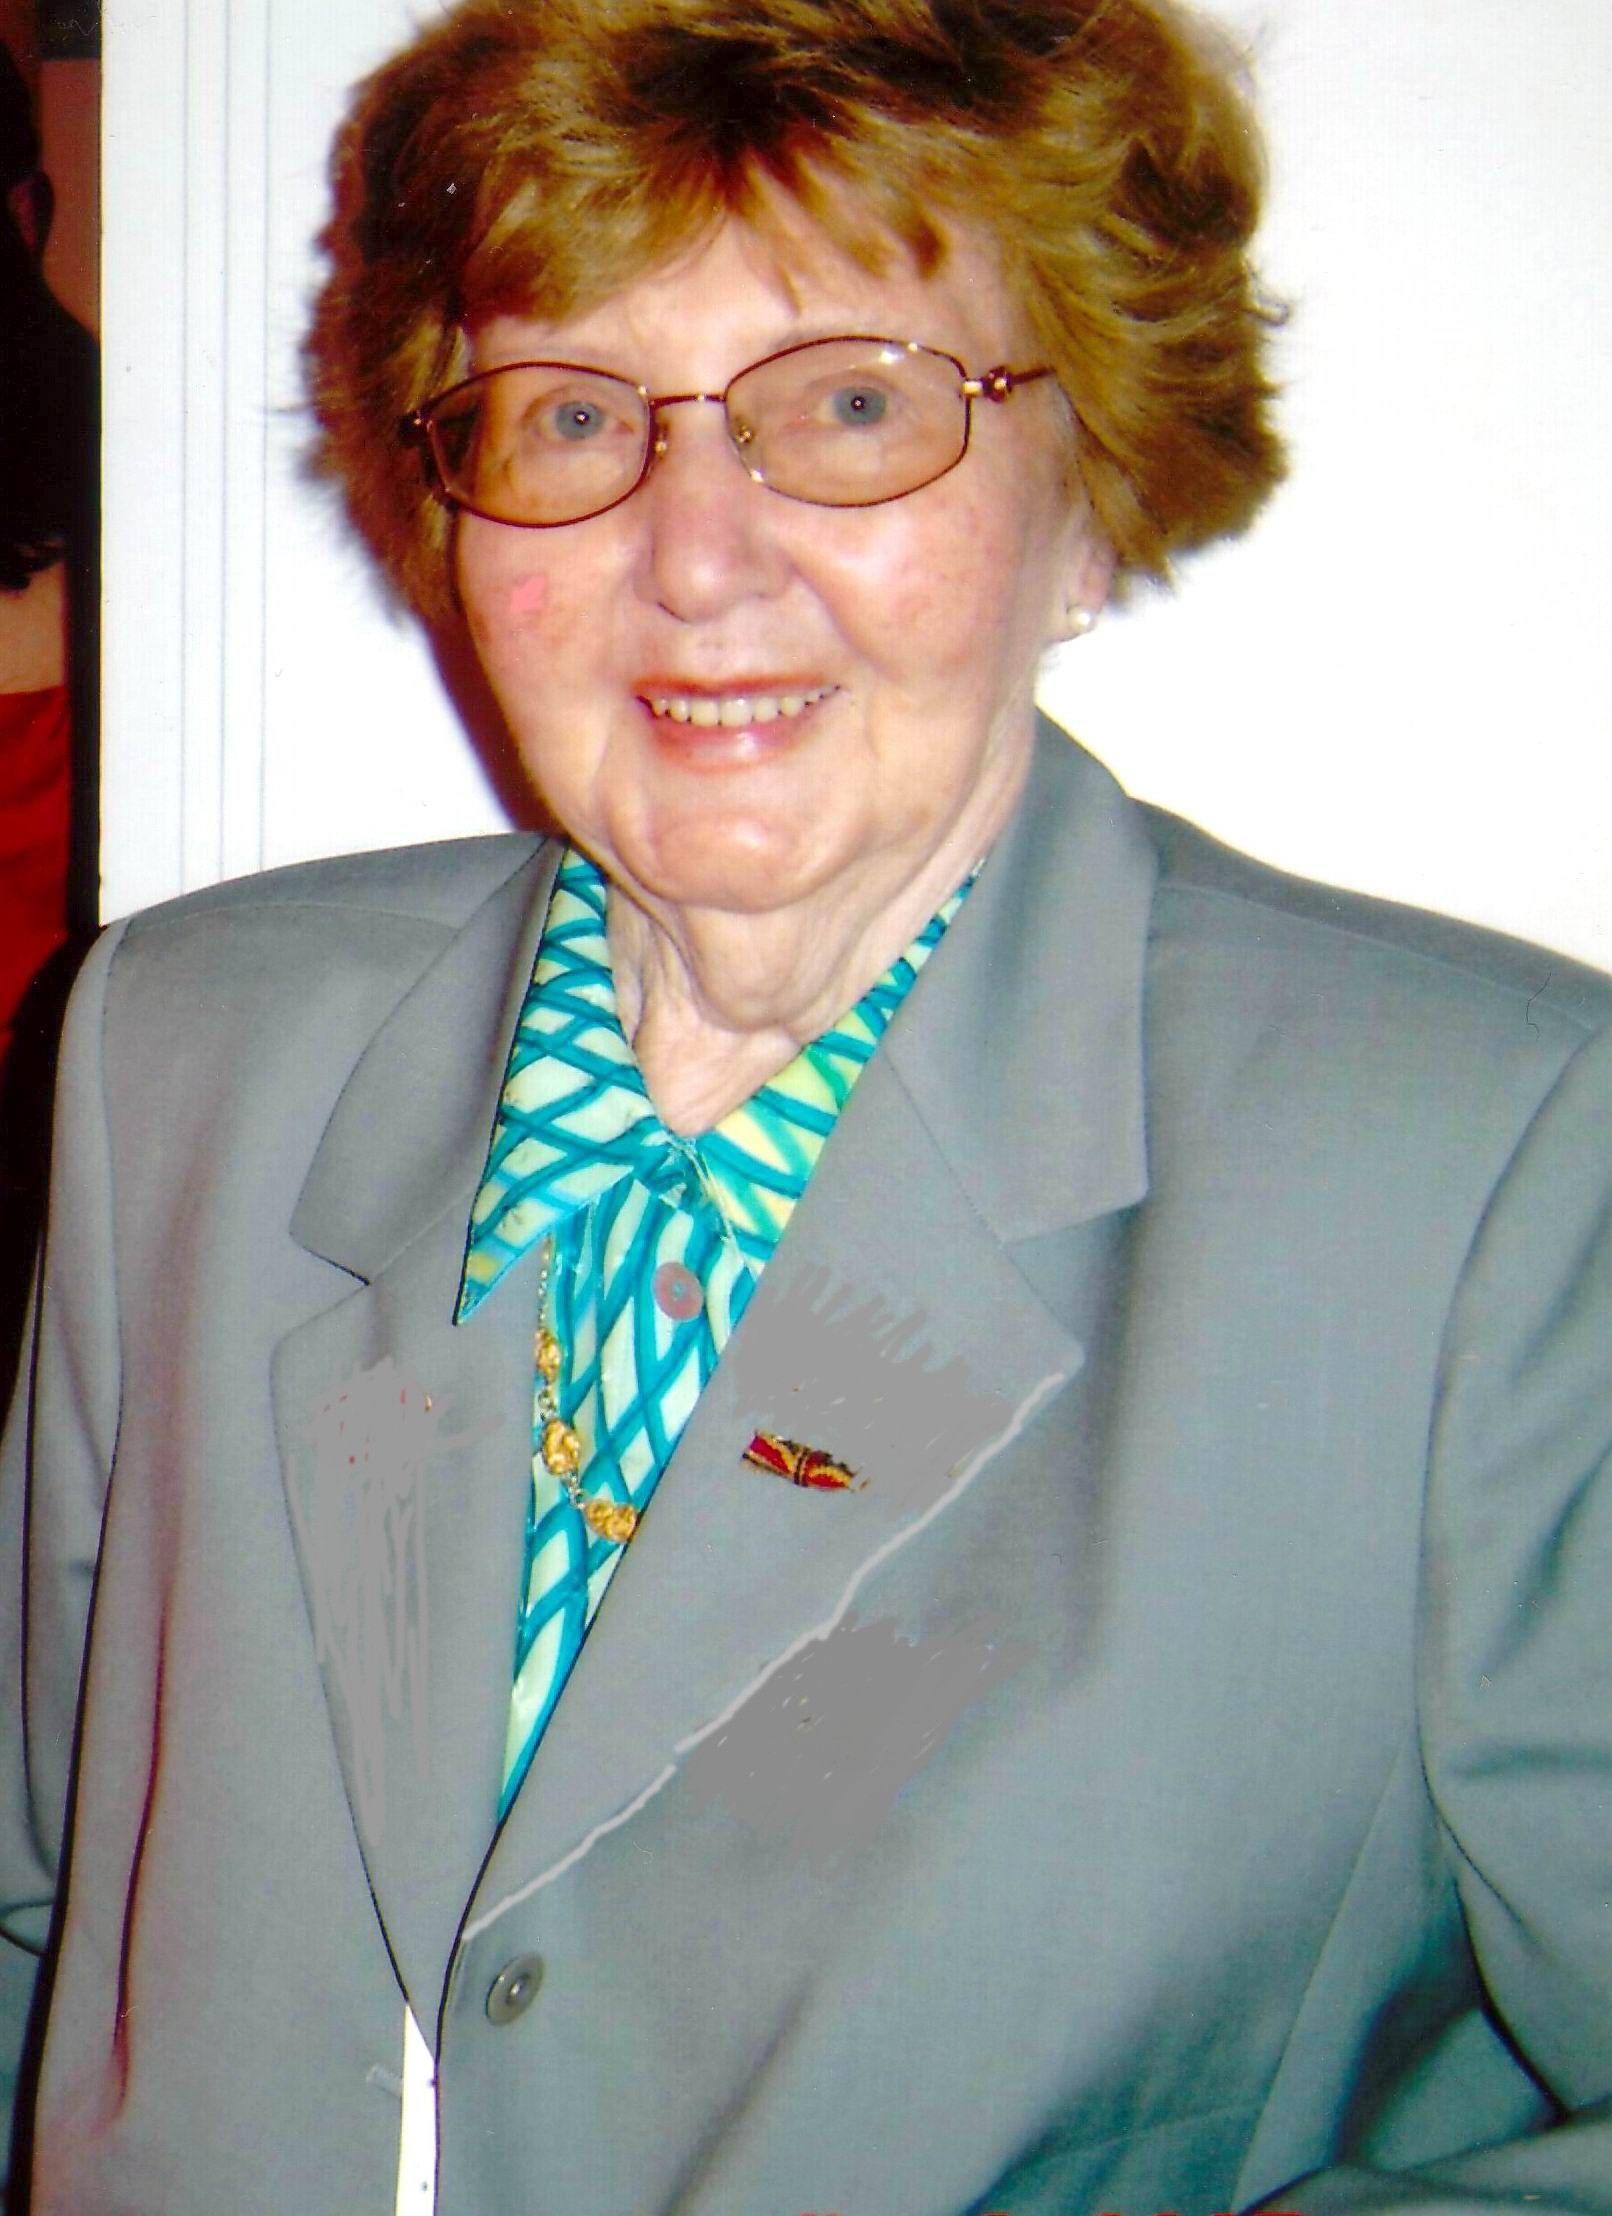 Marianne Englert 2005 in Hamburg